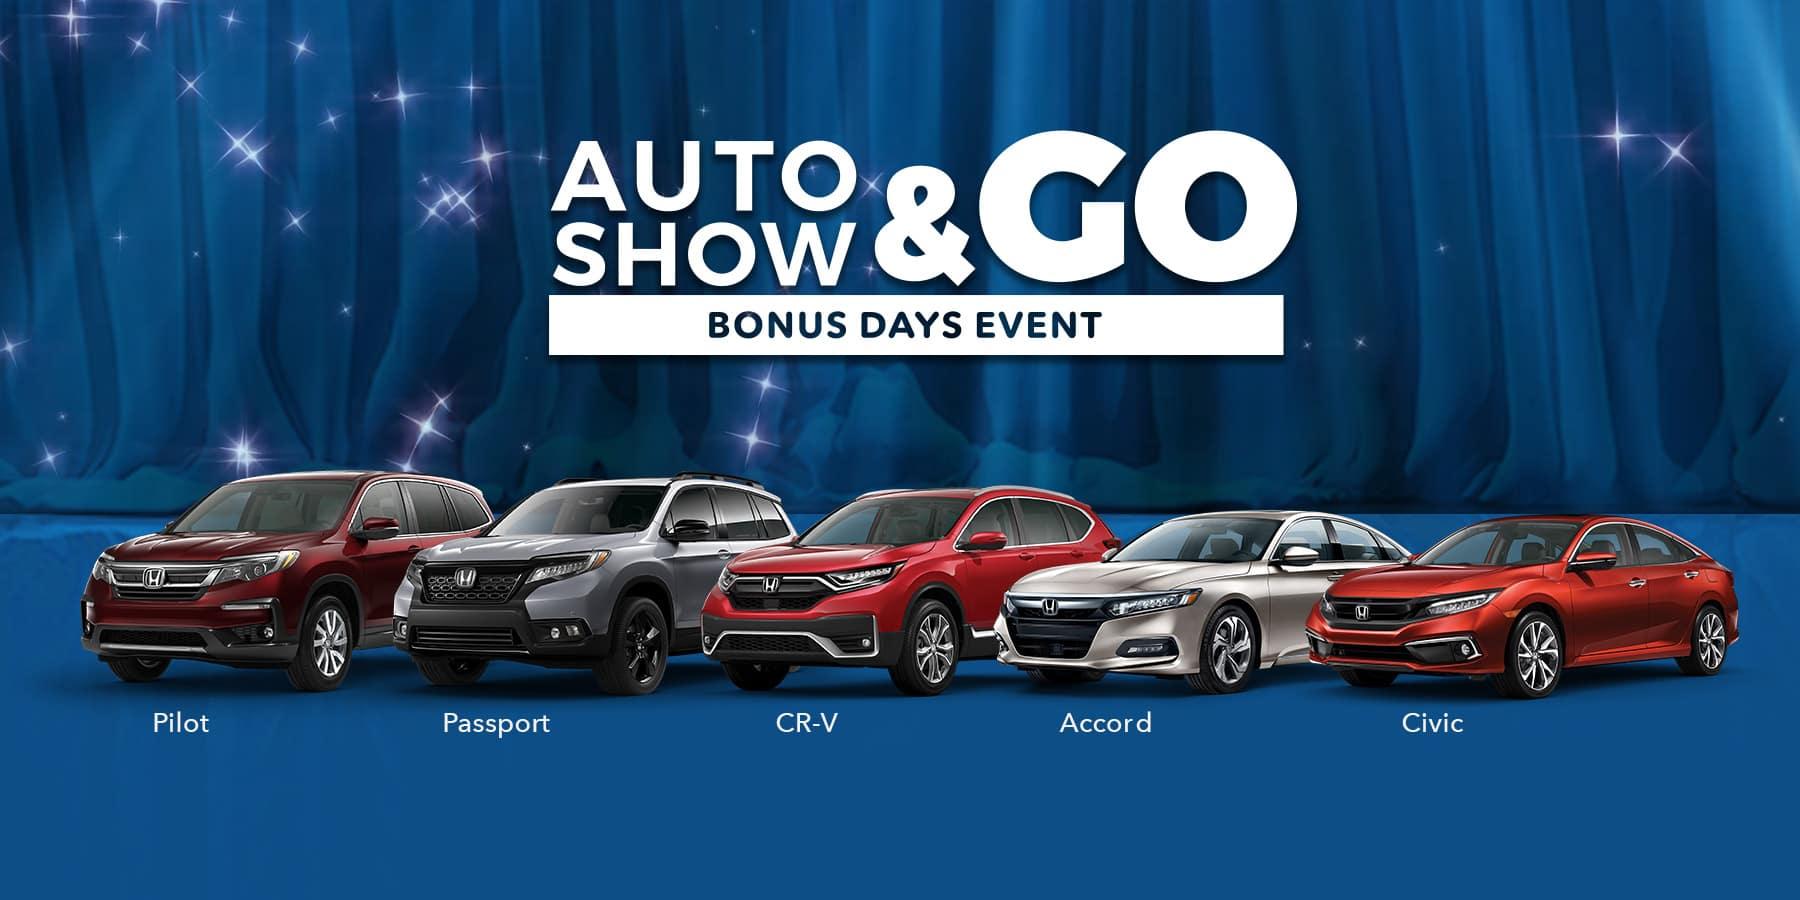 Auto Show & Go Bonus Days Event. Sparkly Background with Pilot, Passport, CR-V, Accord and Civic